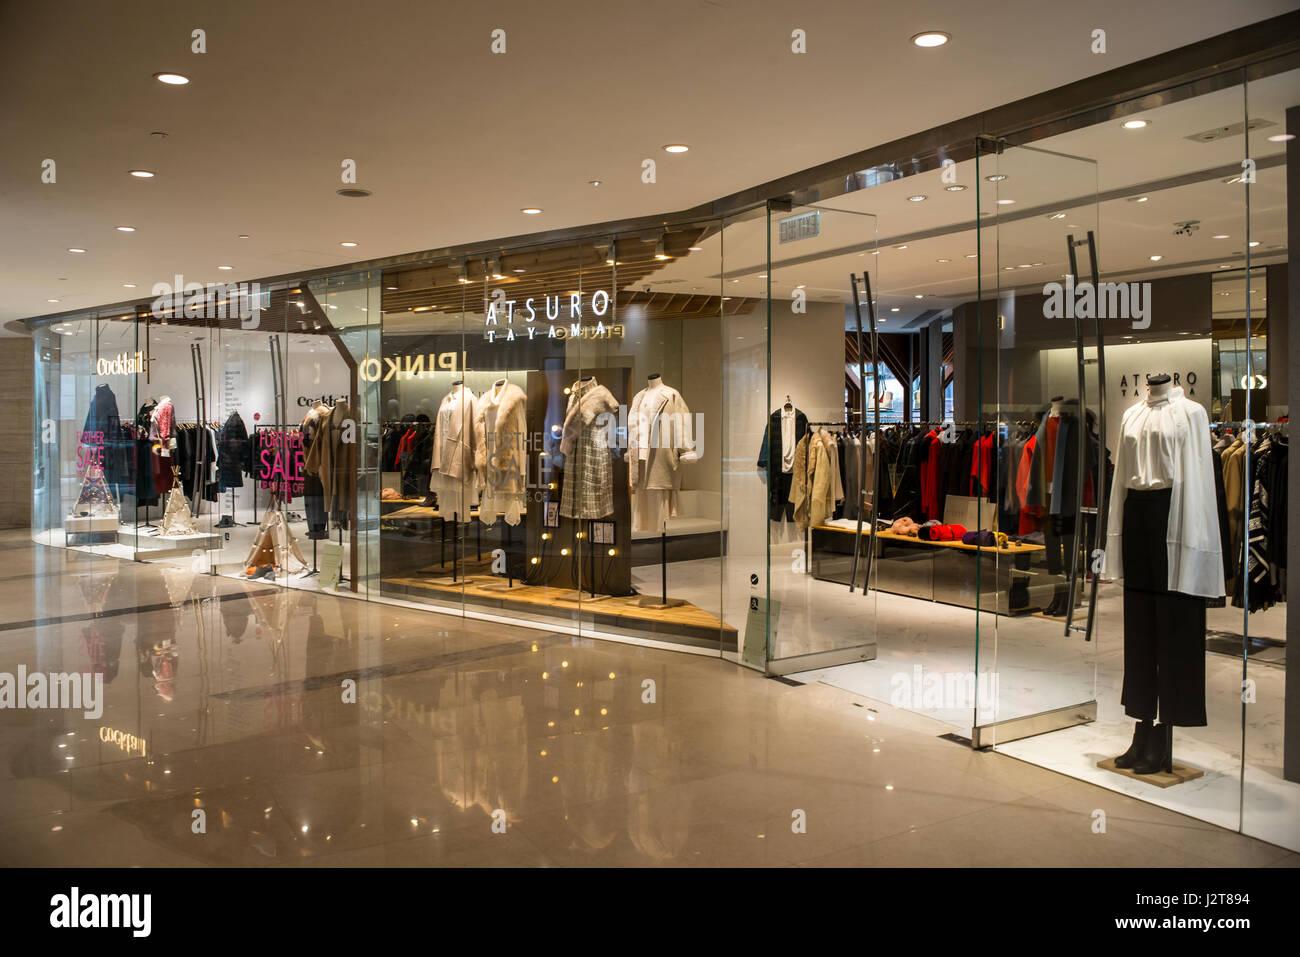 Lee Gardens Shopping Mall, Causeway Bay, Hong Kong - Stock Image